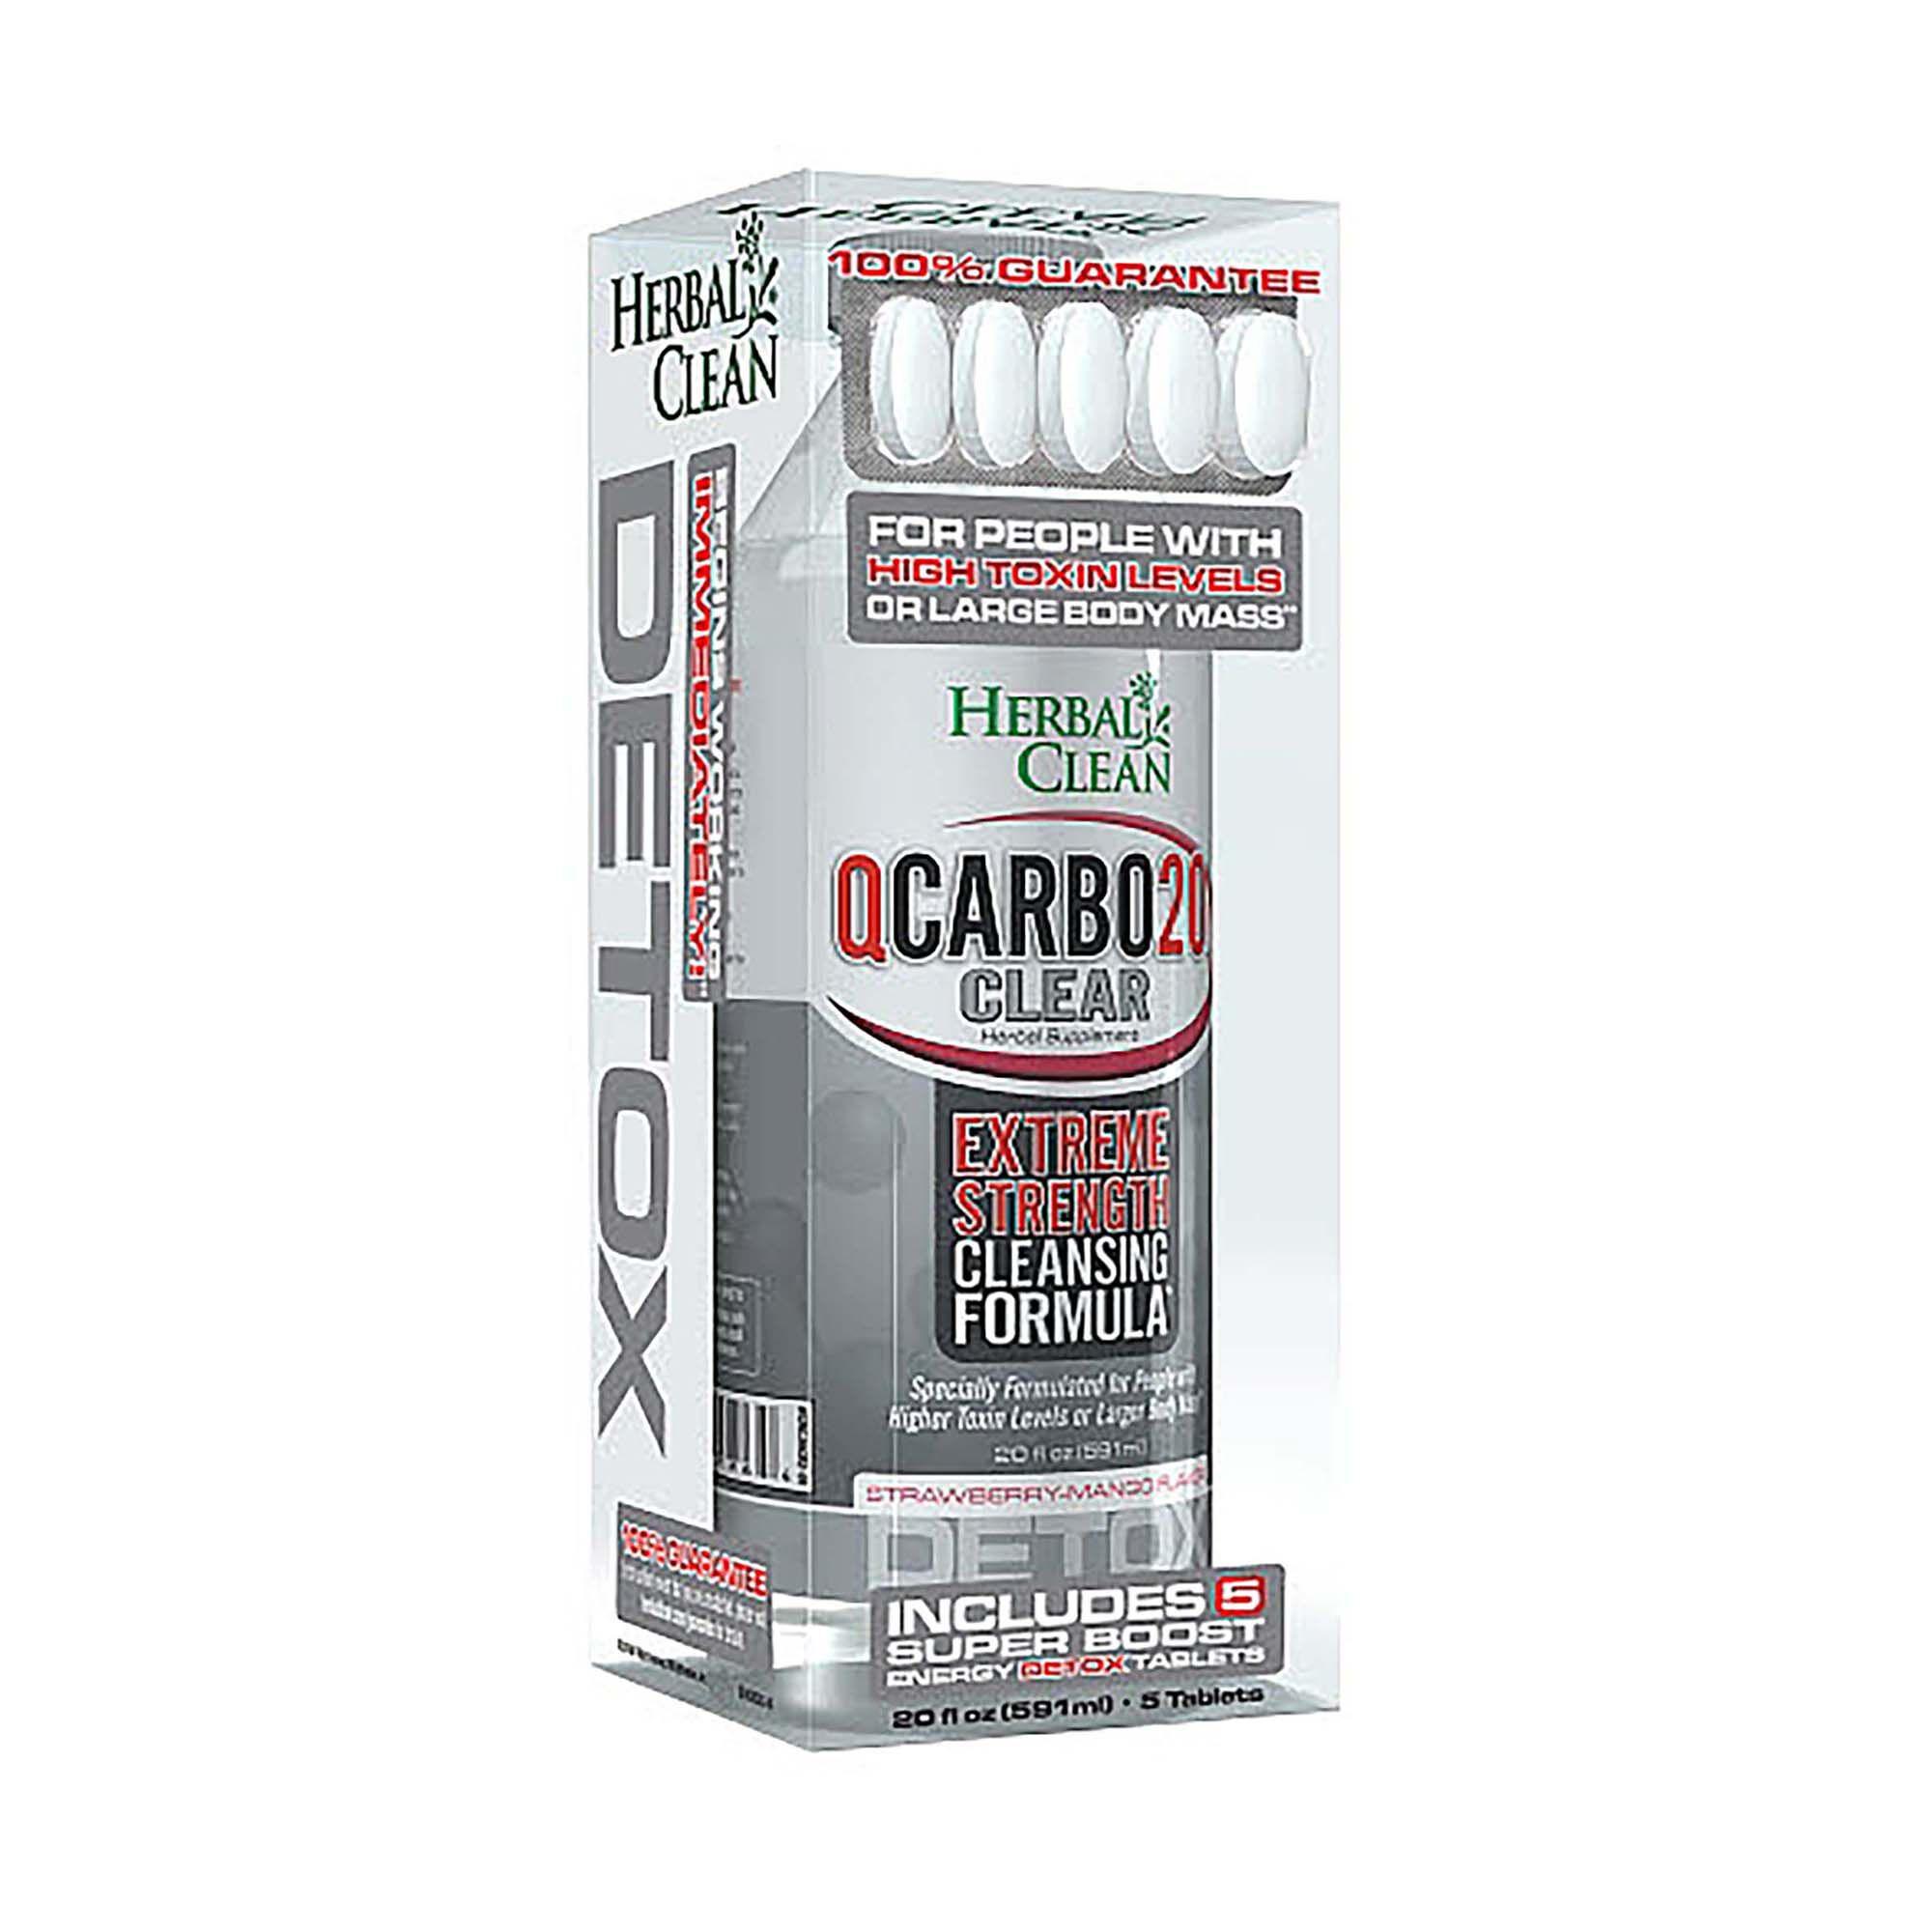 Herbal Clean® QCARBO20™ CLEAR